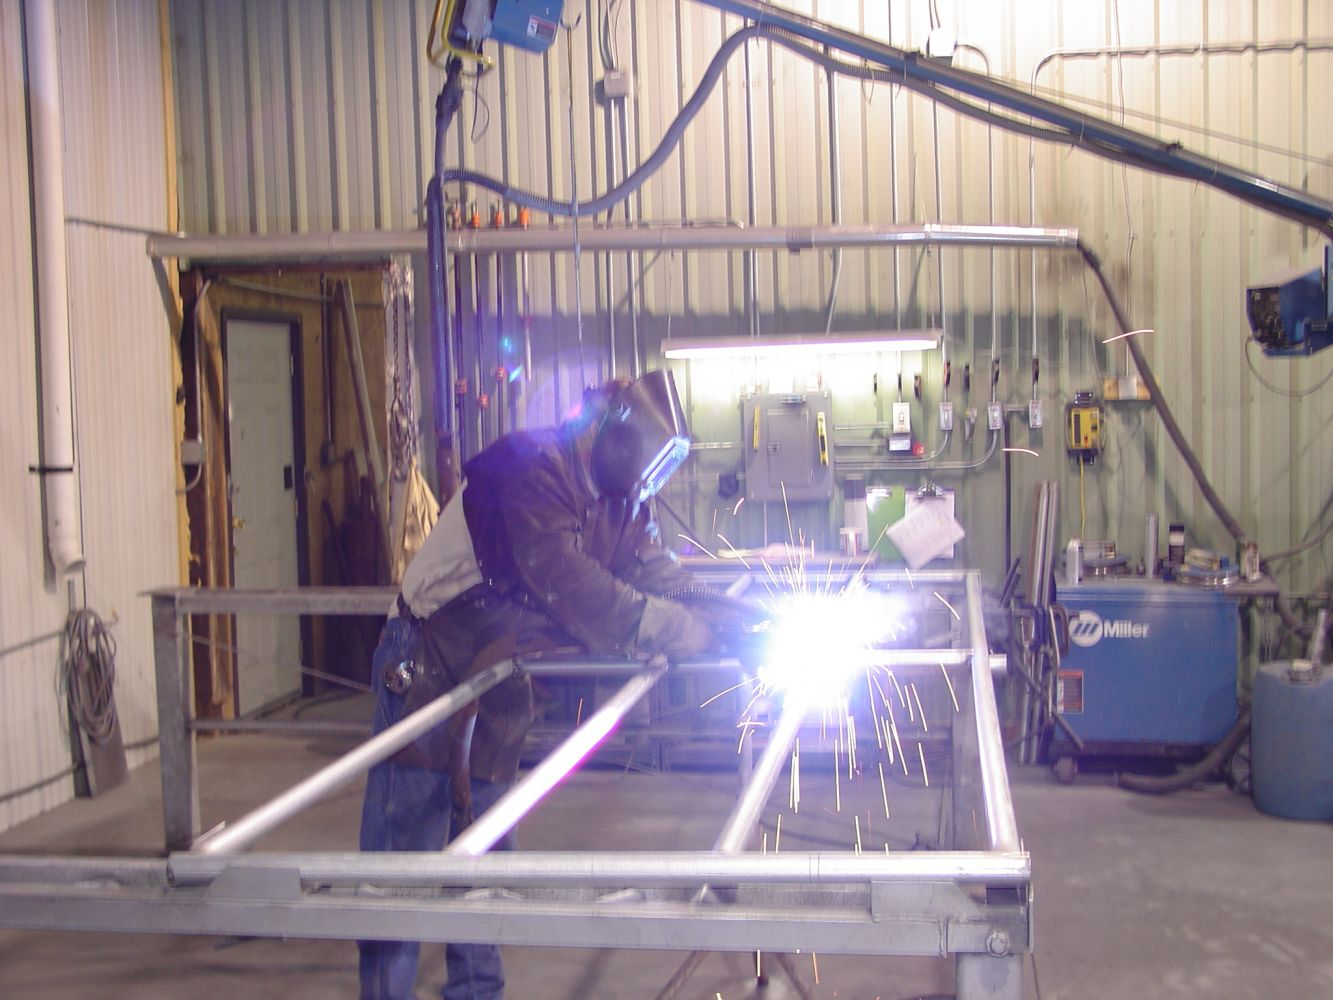 Custom Fences build here in Palmer AK.